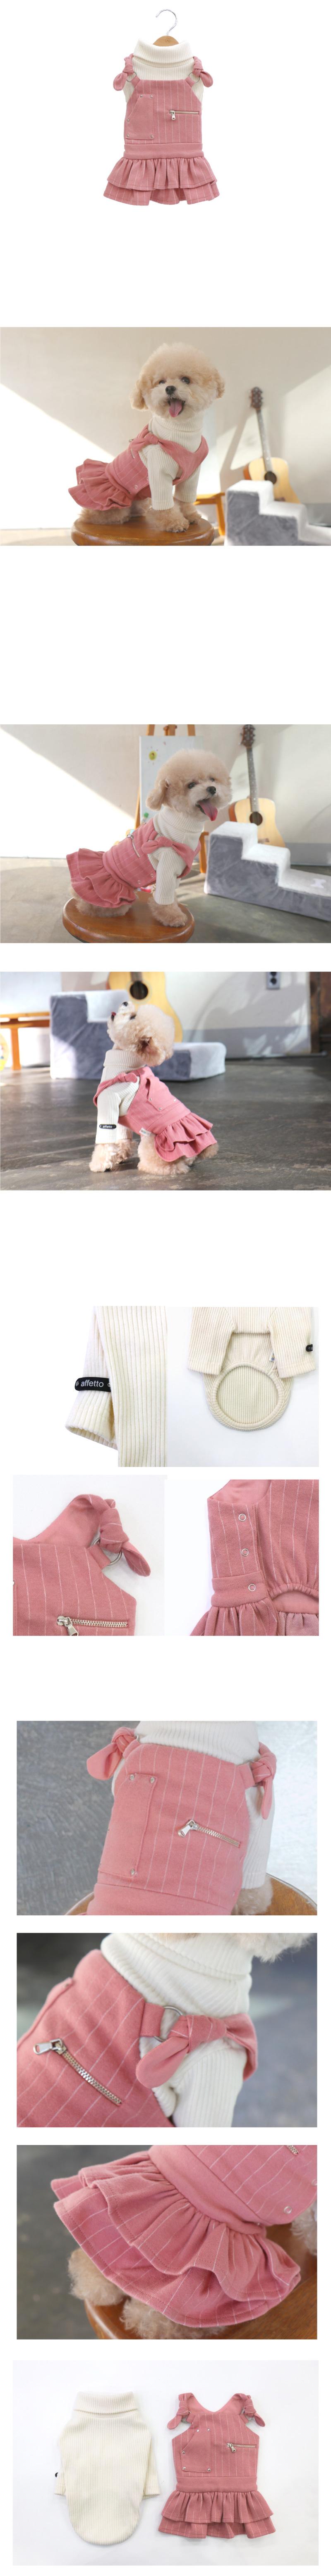 sugar-overalls-.jpg